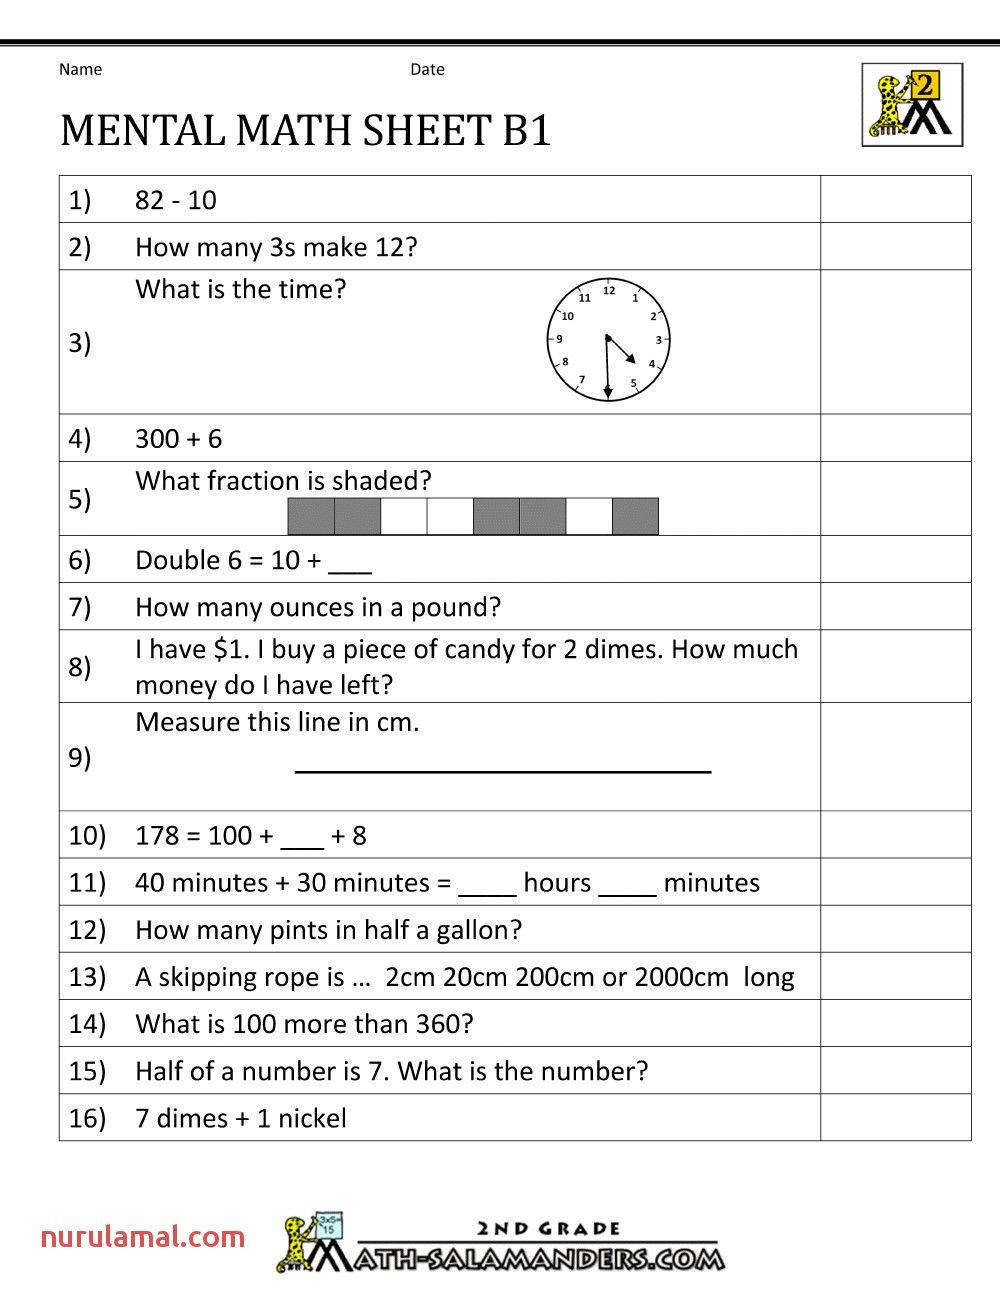 Mental Maths Worksheets For Class 1 Mental Math Mental Maths Worksheets Mental Maths Tests